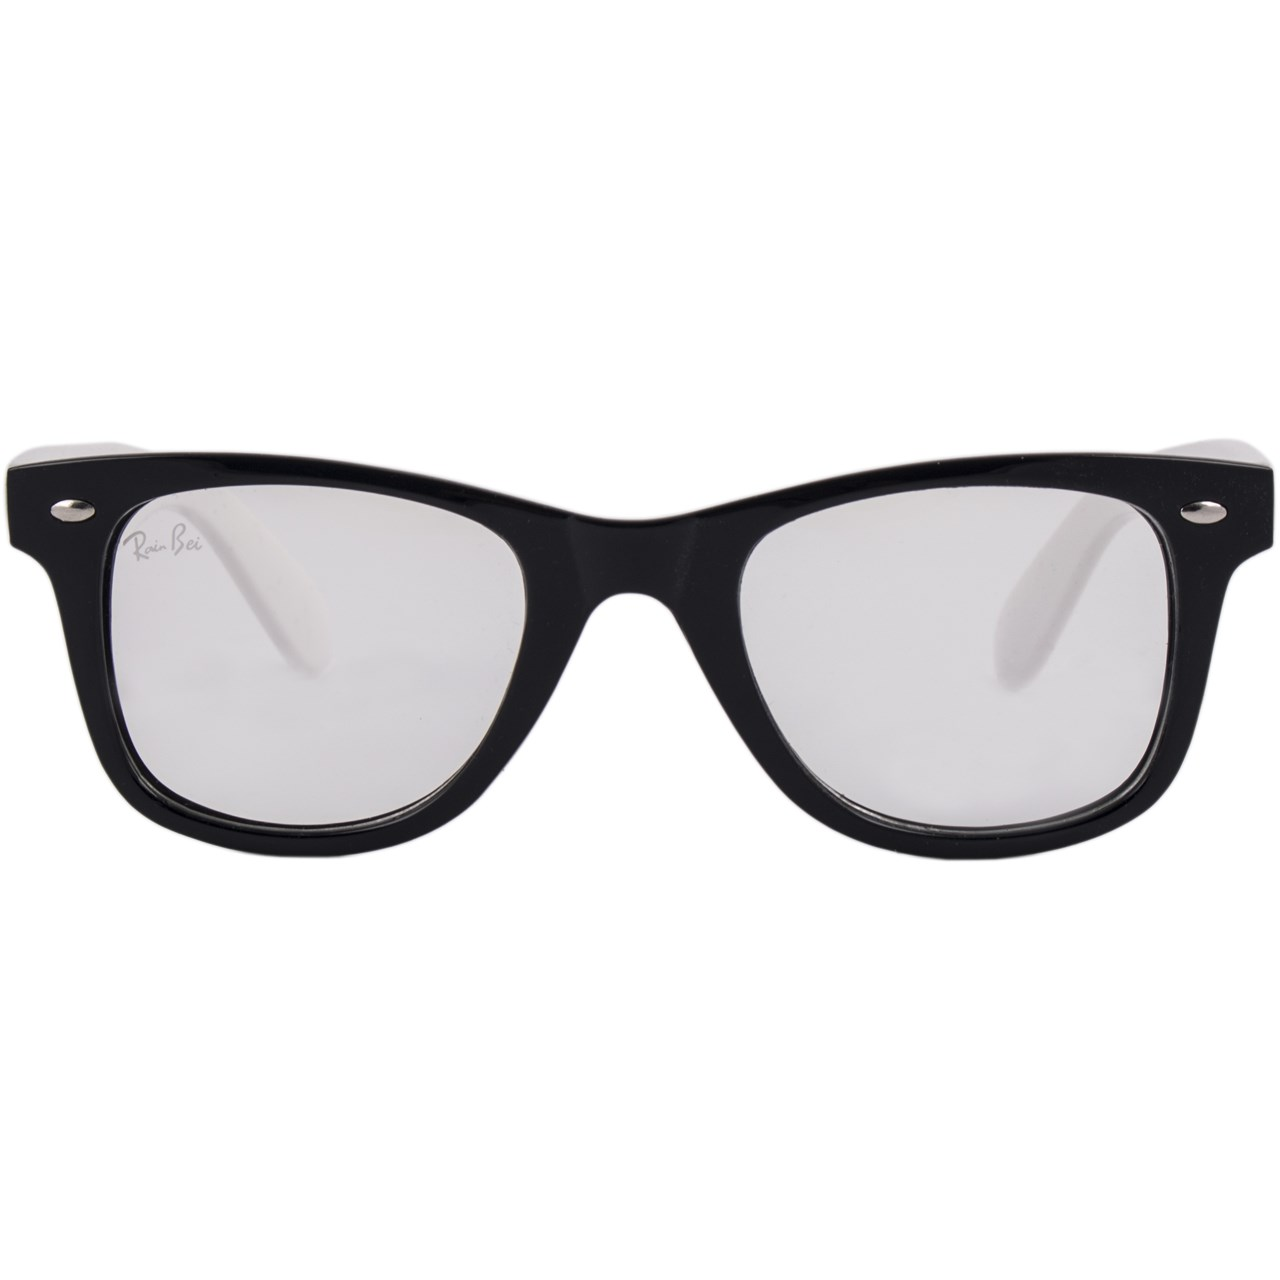 فریم عینک واته مدل9001BL-WT